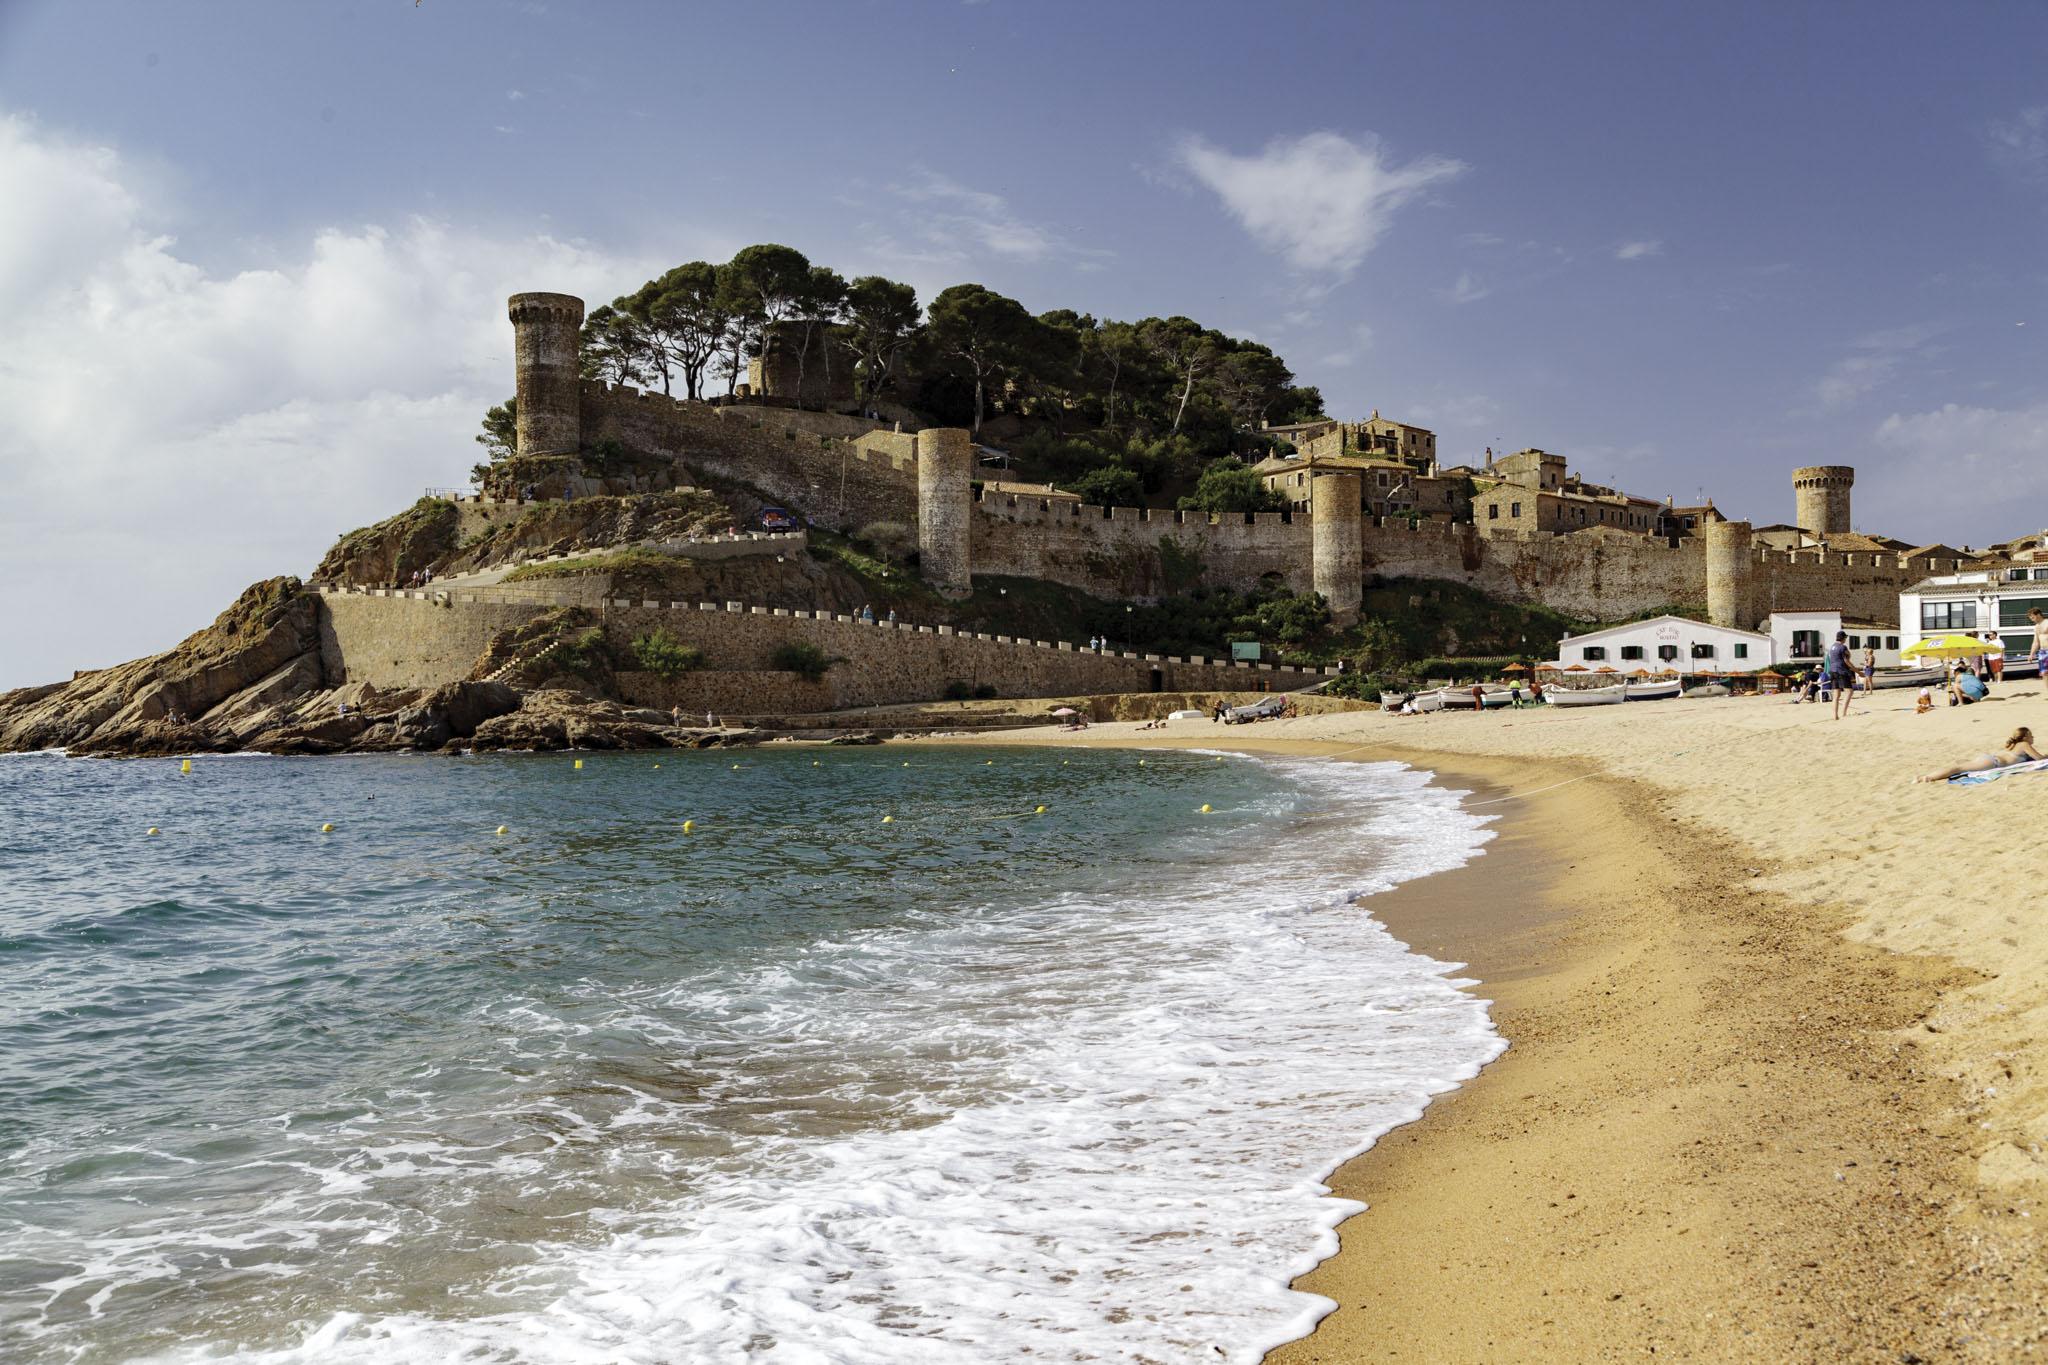 Costa Brava, Spain